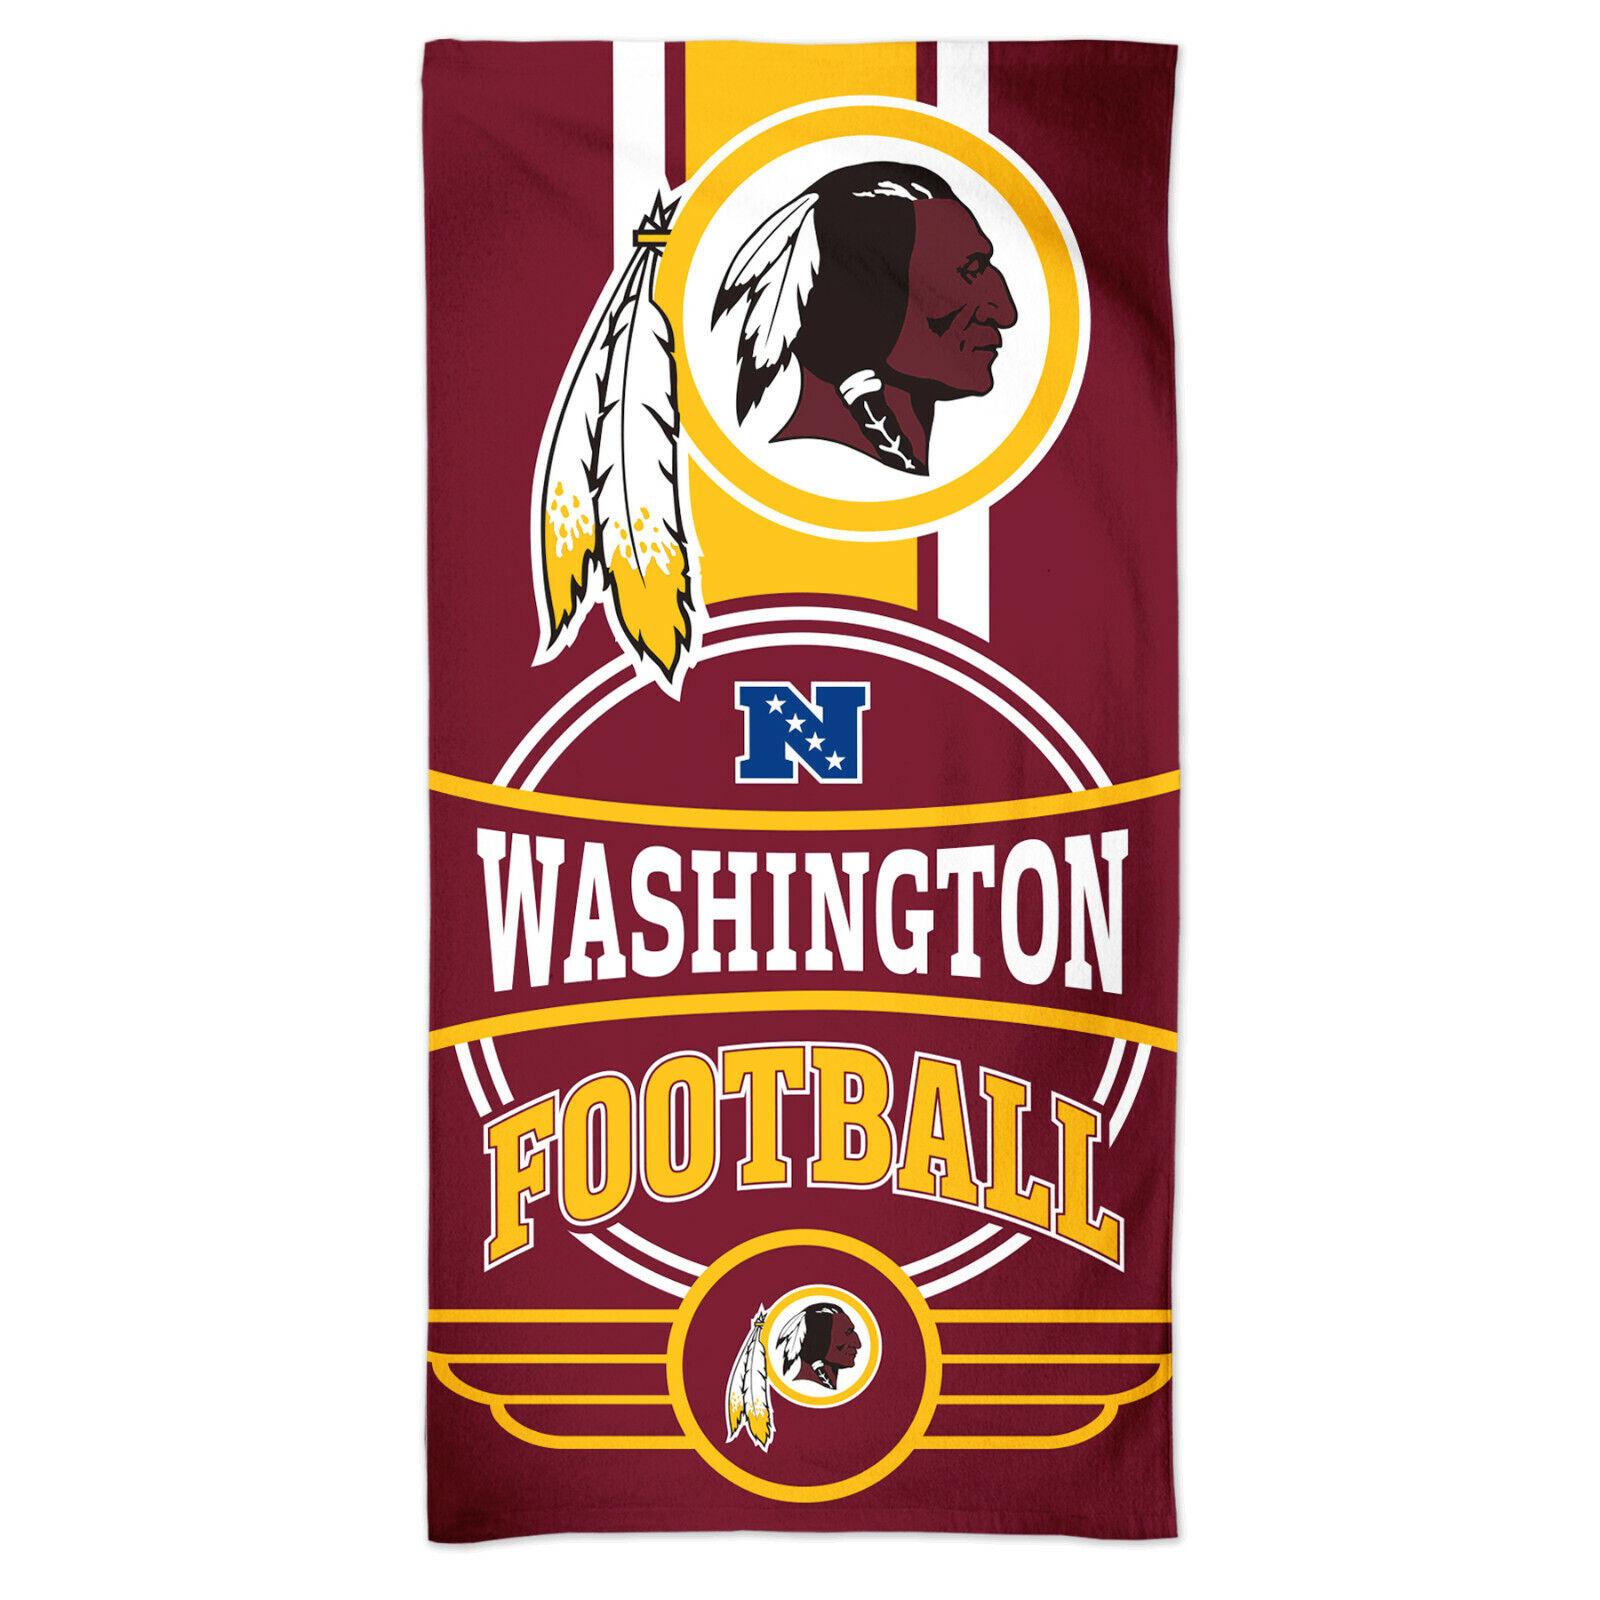 NFL Badetuch Washington Redskins Logo Beach Towel Handtuch 150x75cm 099606284556